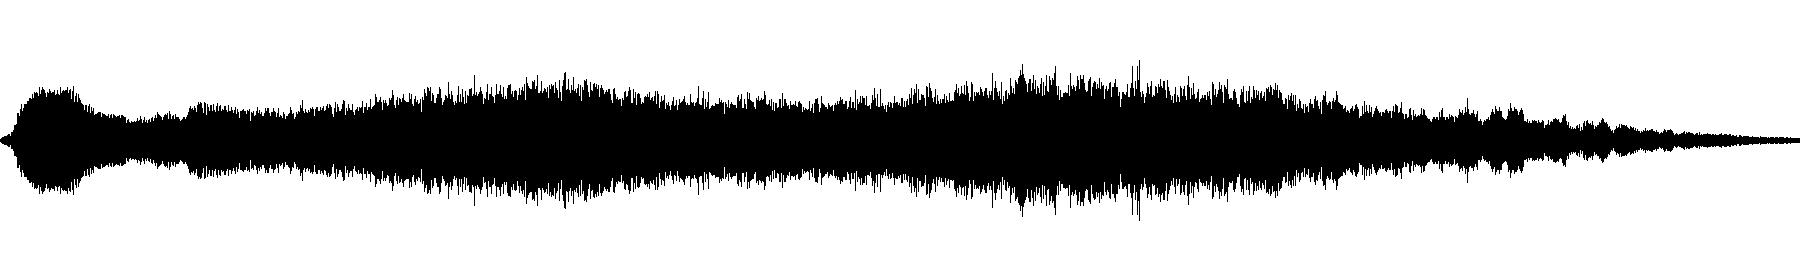 176395 dark soundscape 138bpm loop wav